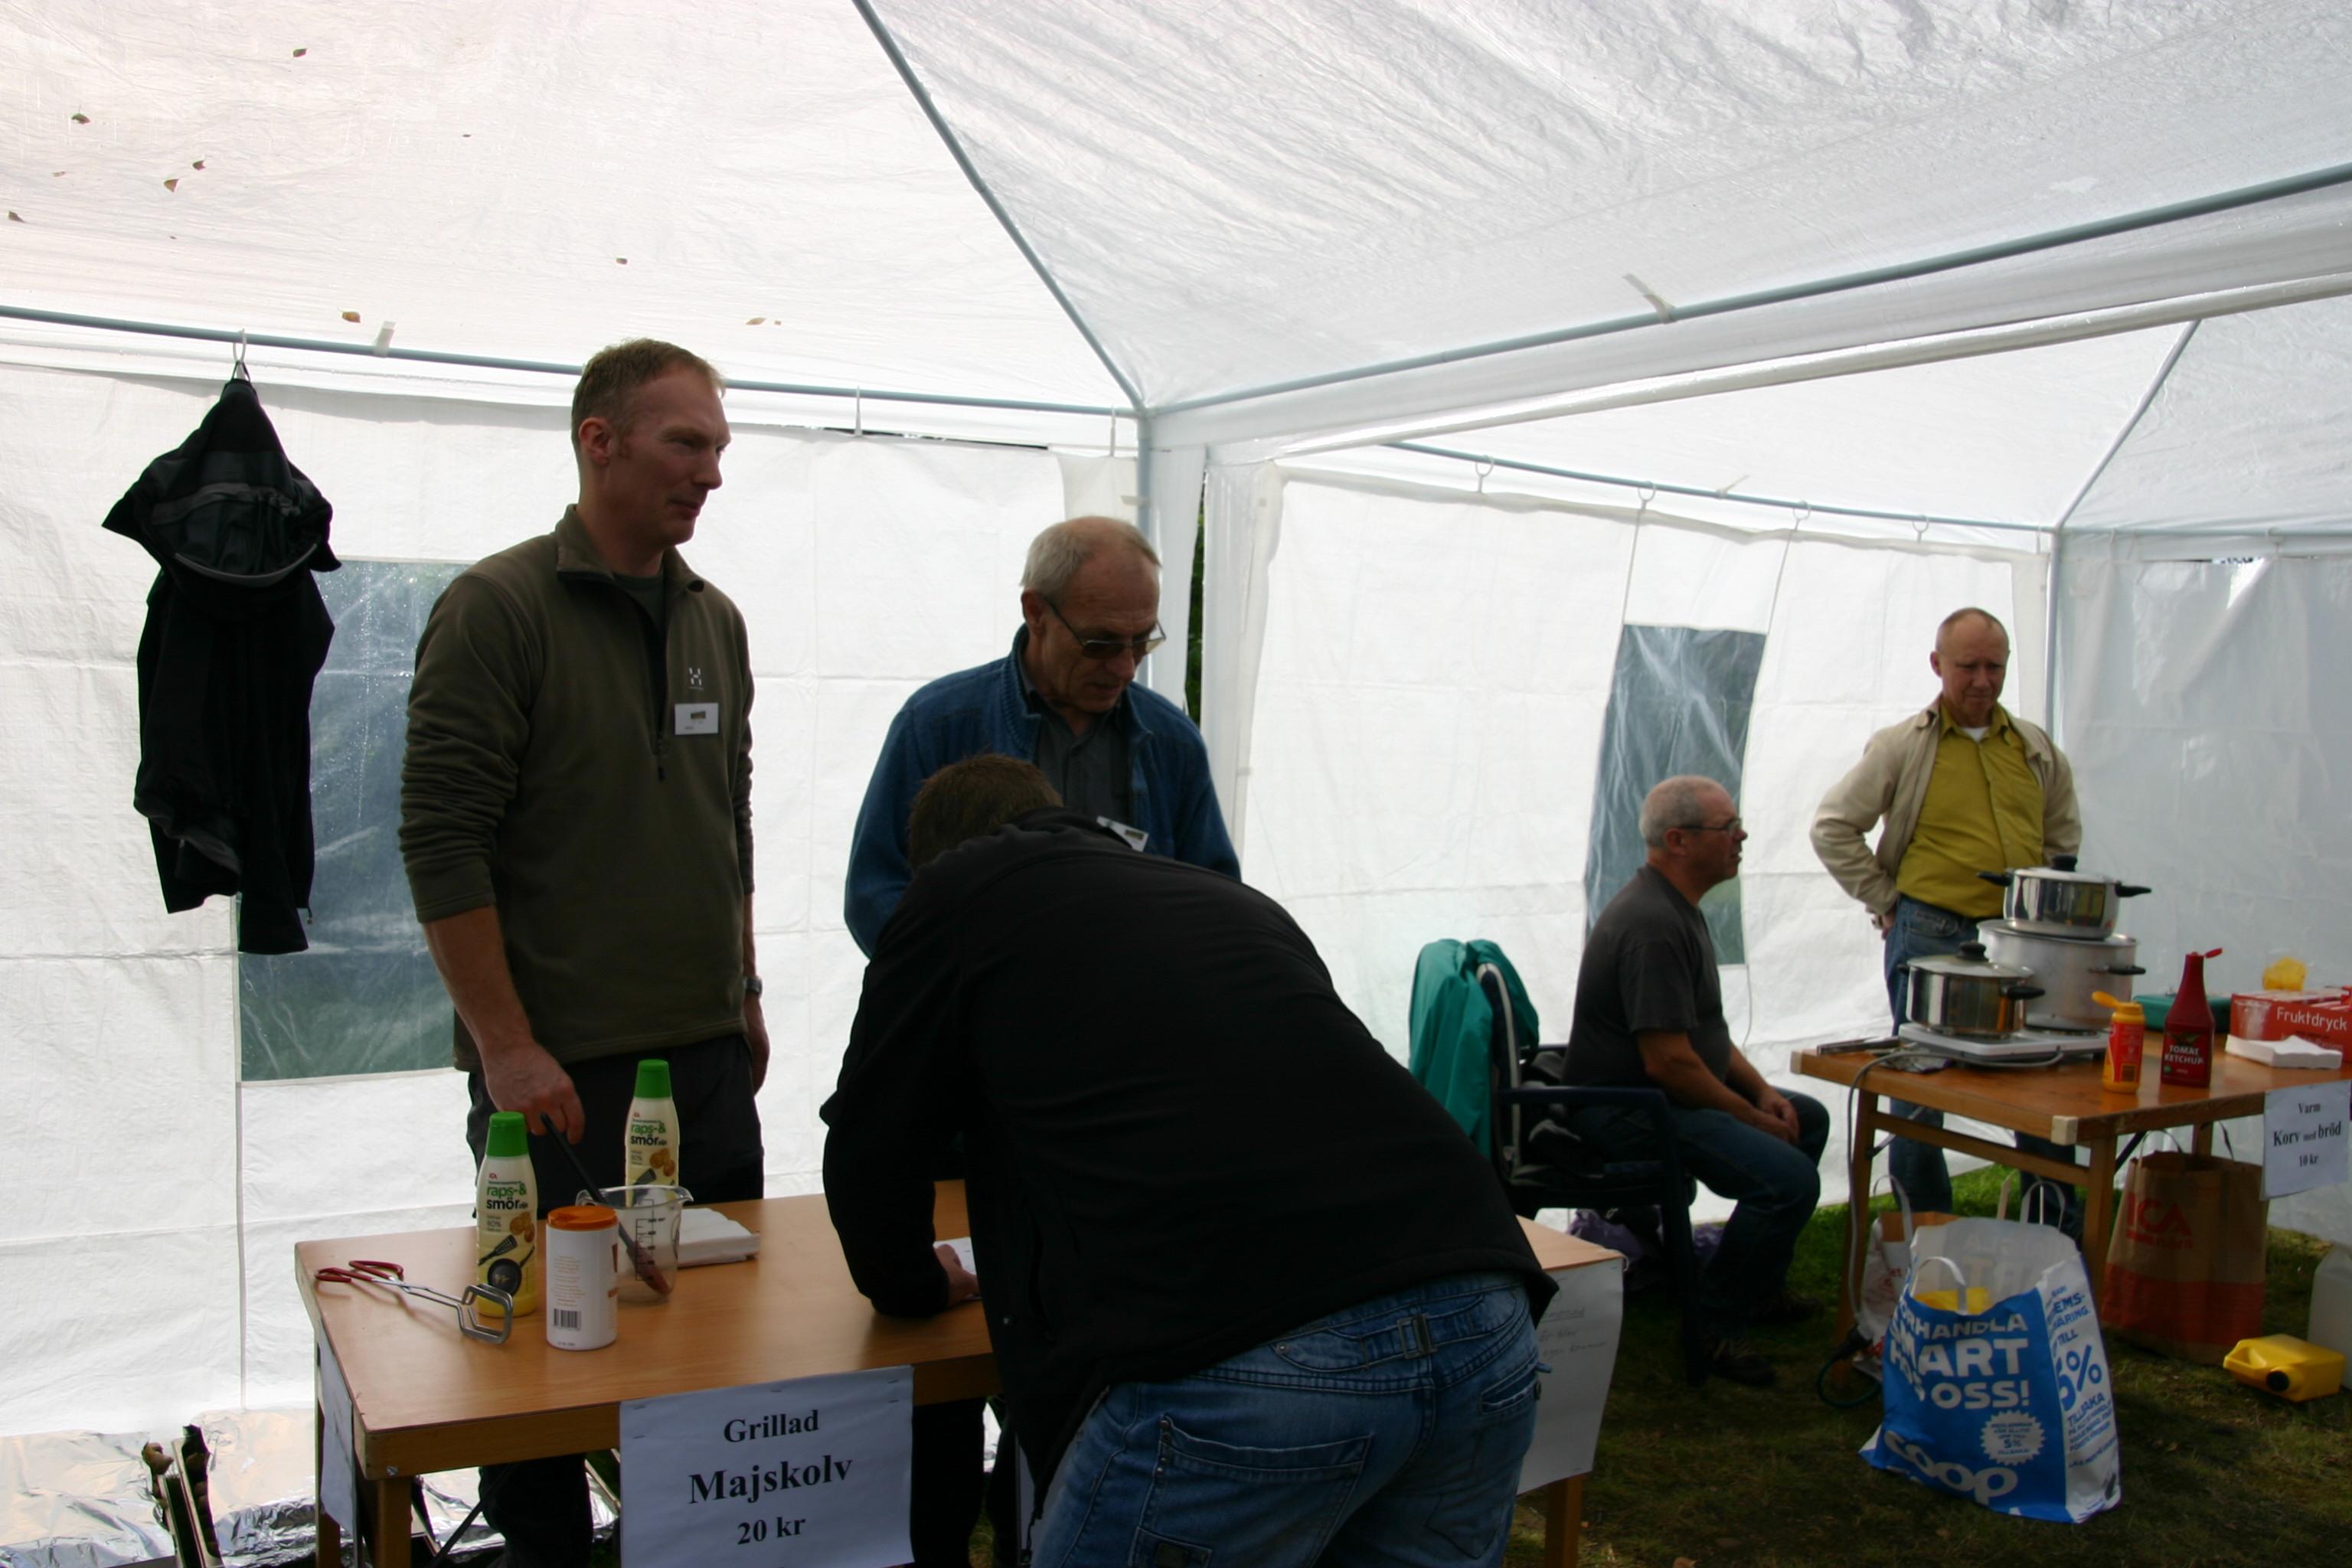 hackvaddagen-2011-099